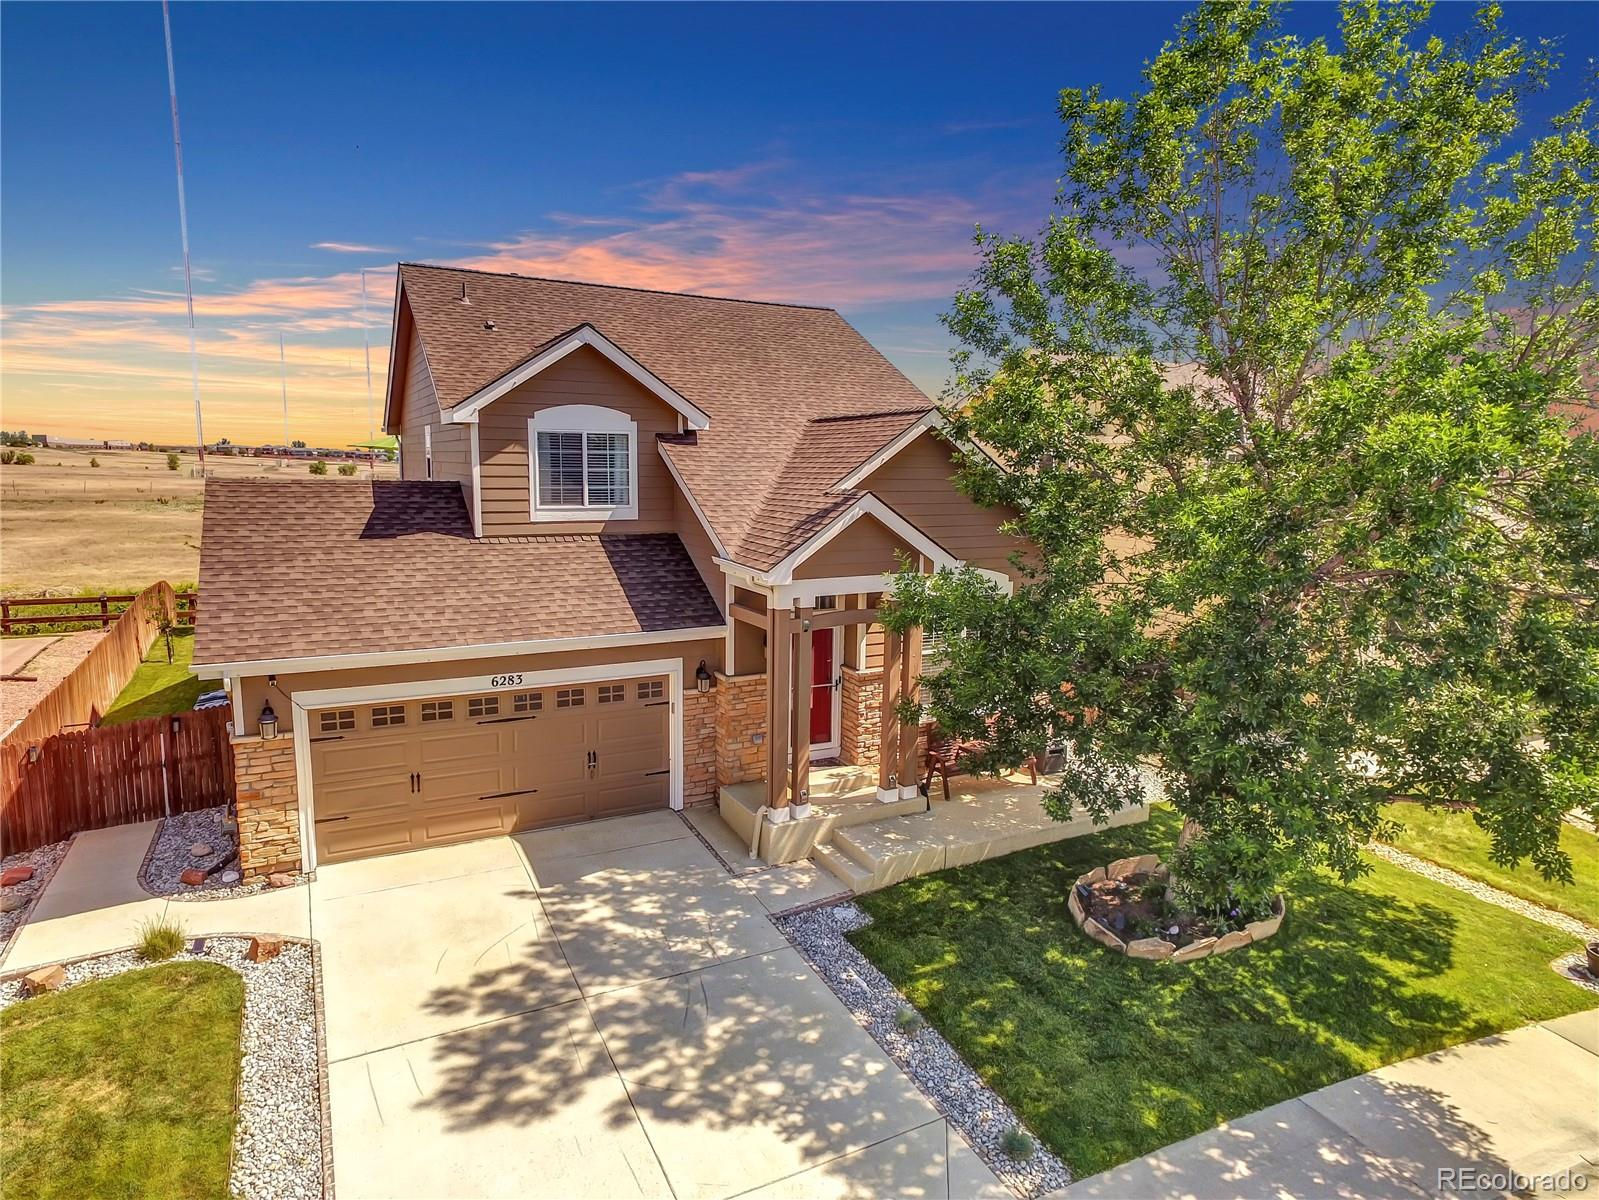 6283 E 116th Avenue Property Photo - Thornton, CO real estate listing